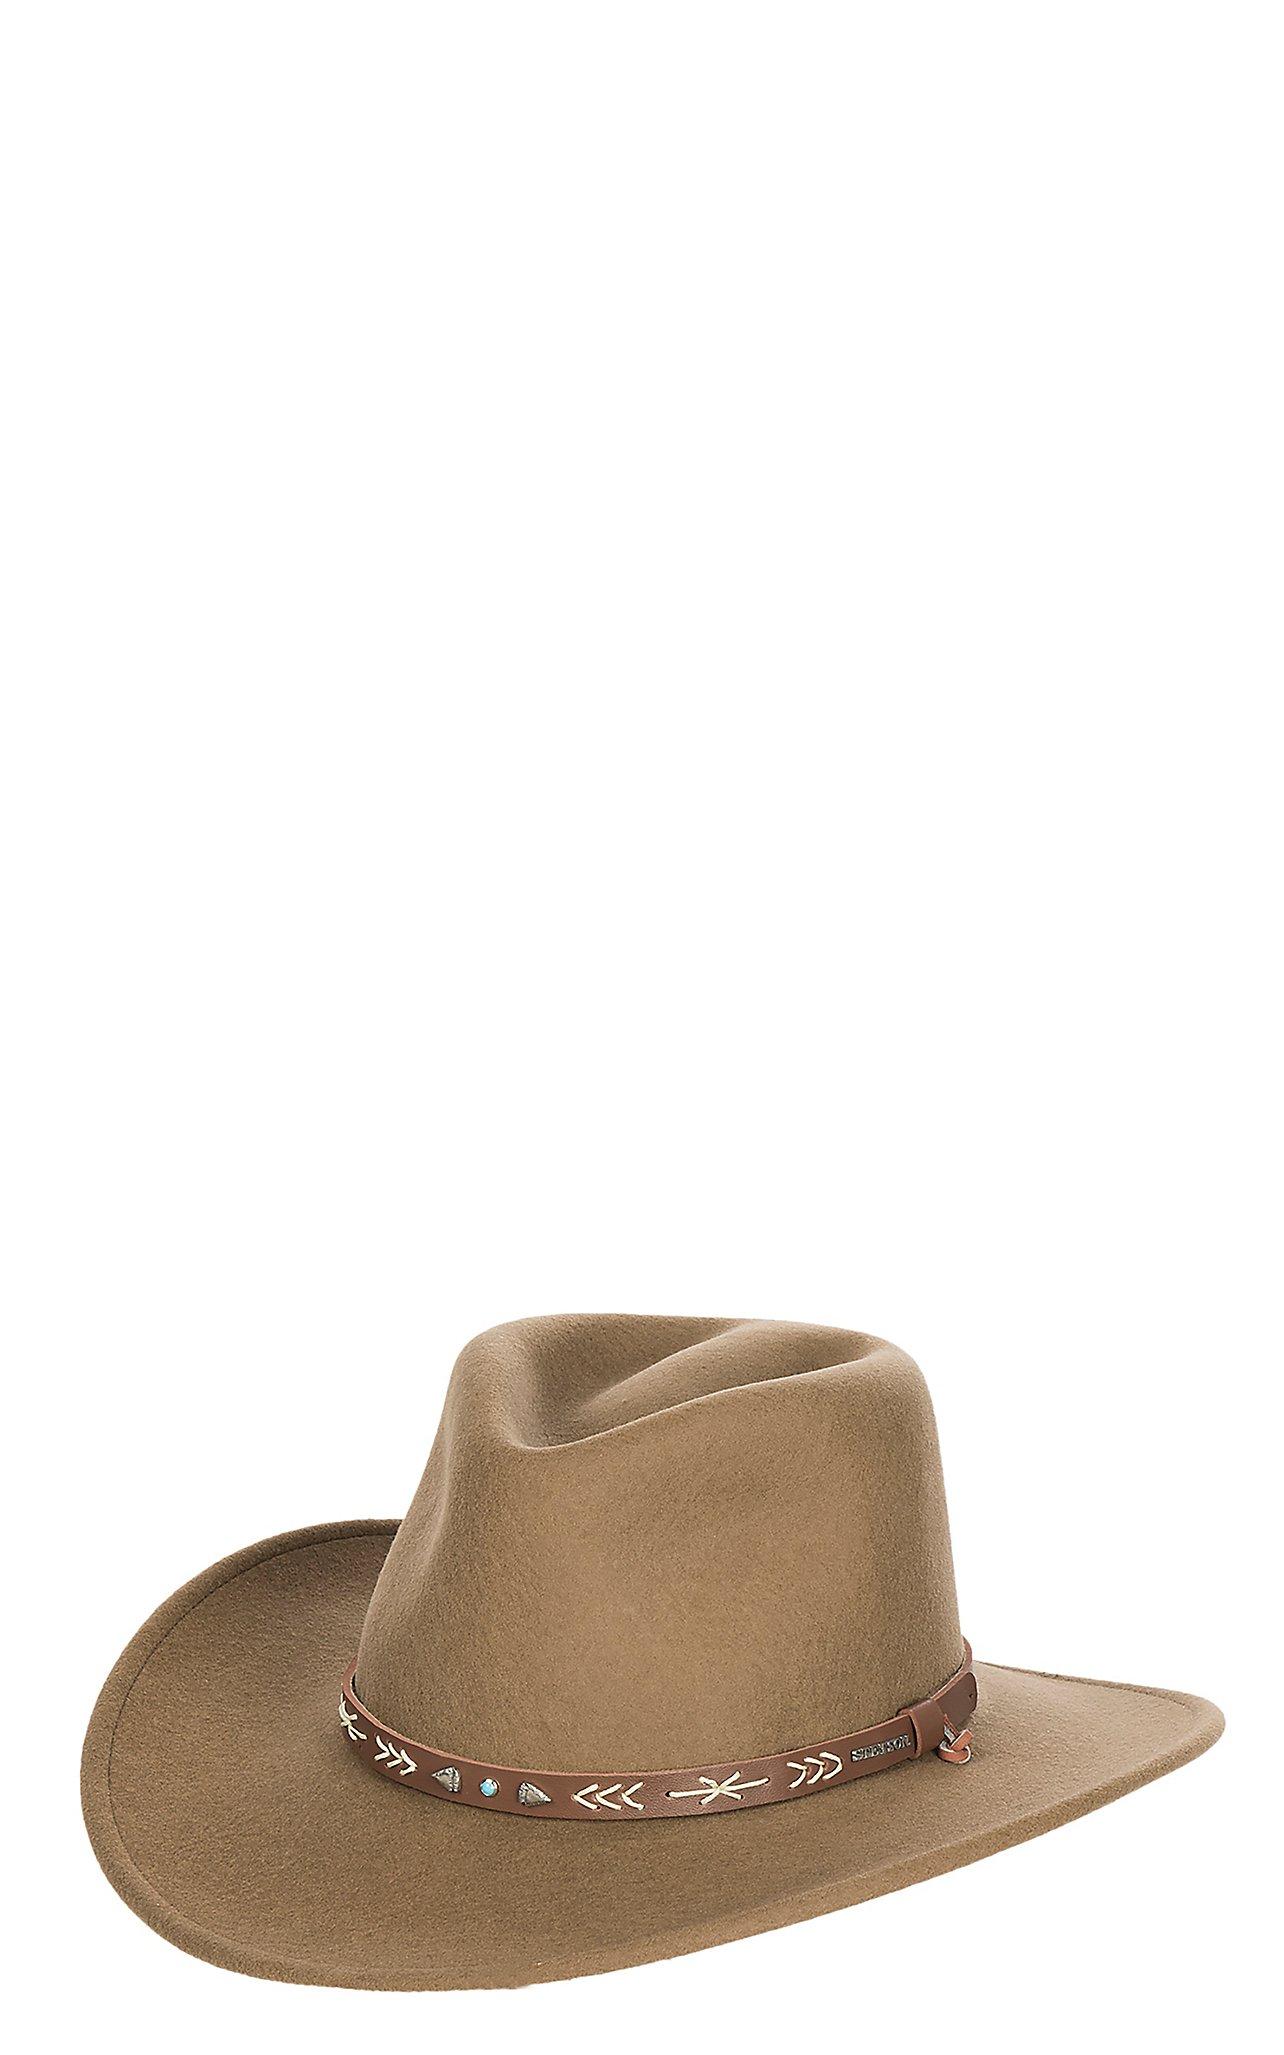 5b8235bc409 Stetson Santa Fe Crushable Tycoon Dri-Lex Wool Cowboy Hat